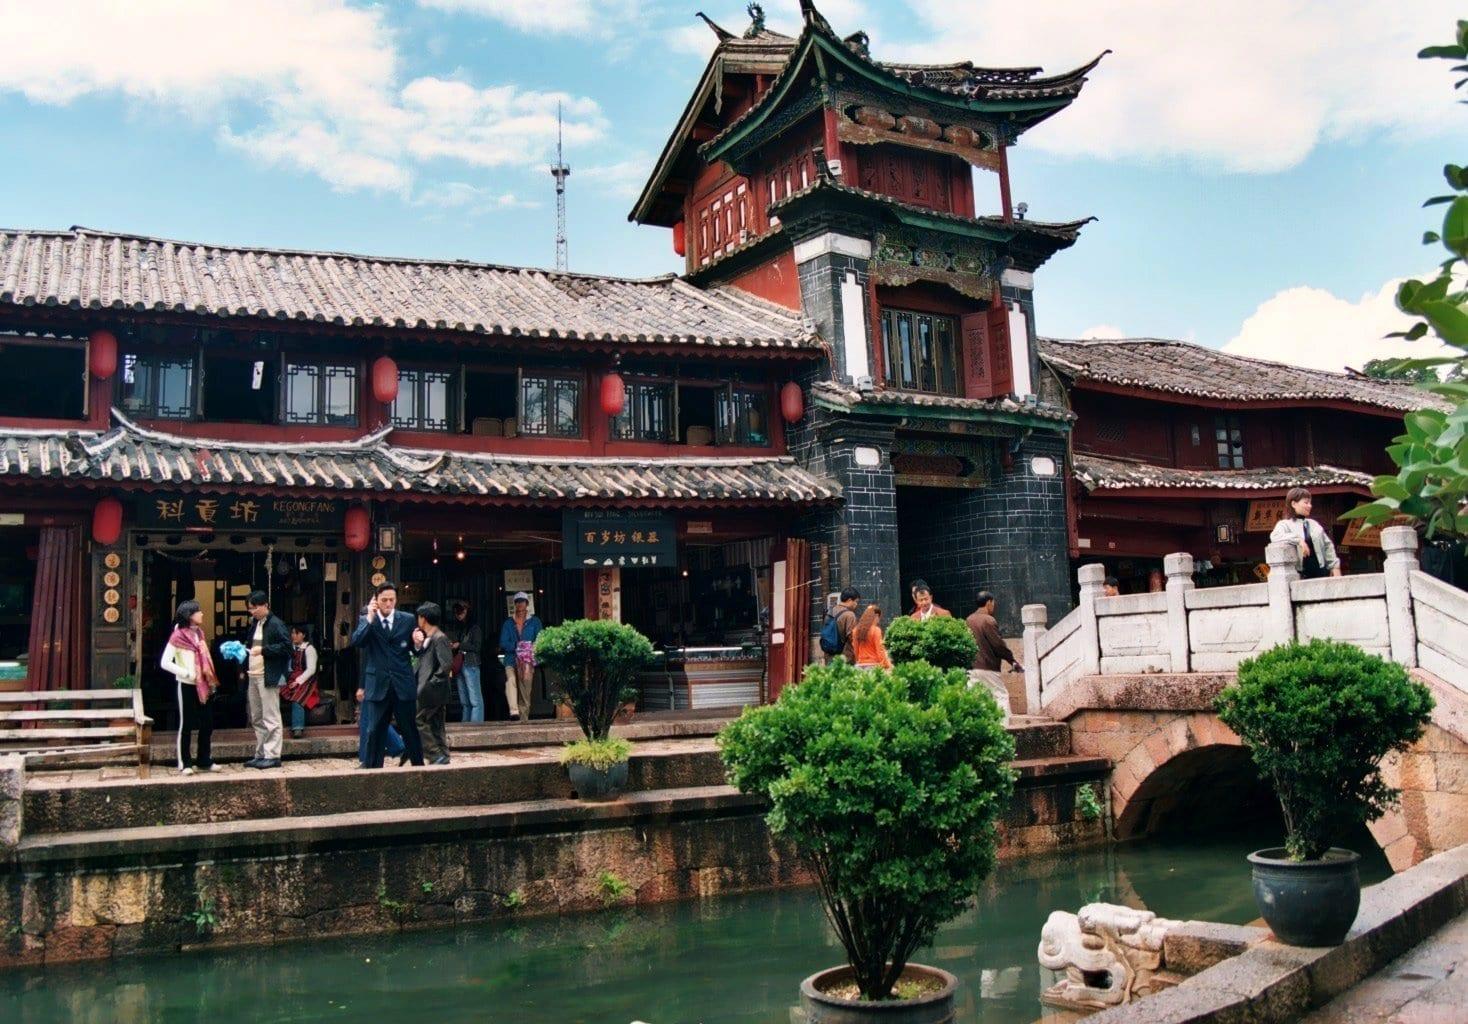 Un canal en el casco antiguo Lijian China